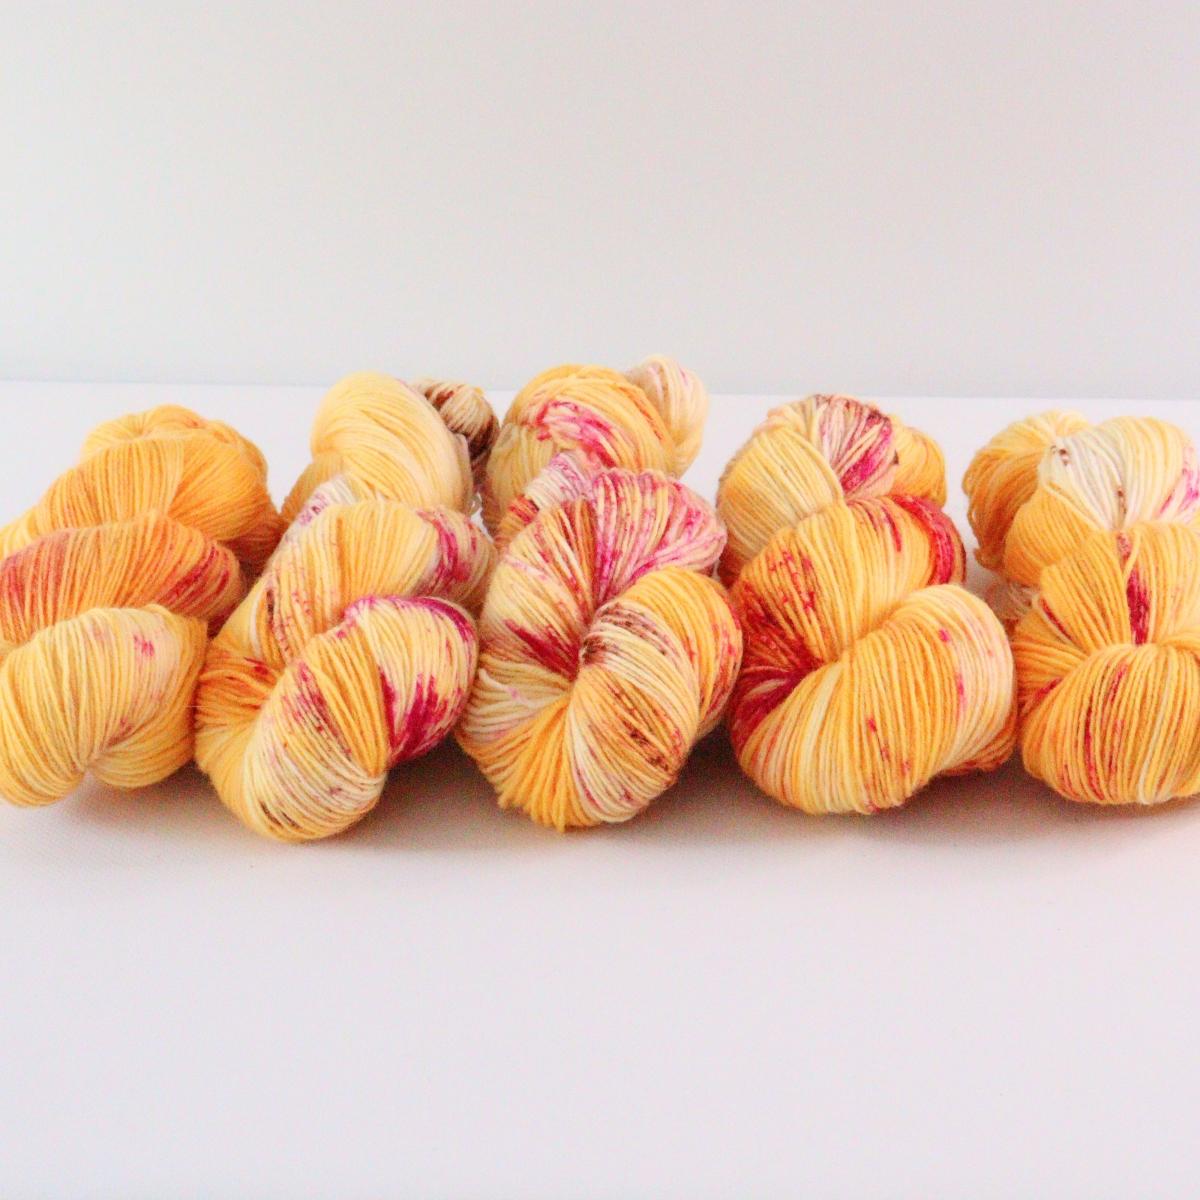 woodico.pro hand dyed yarn 077 4 1200x1200 - Hand dyed yarn / 077